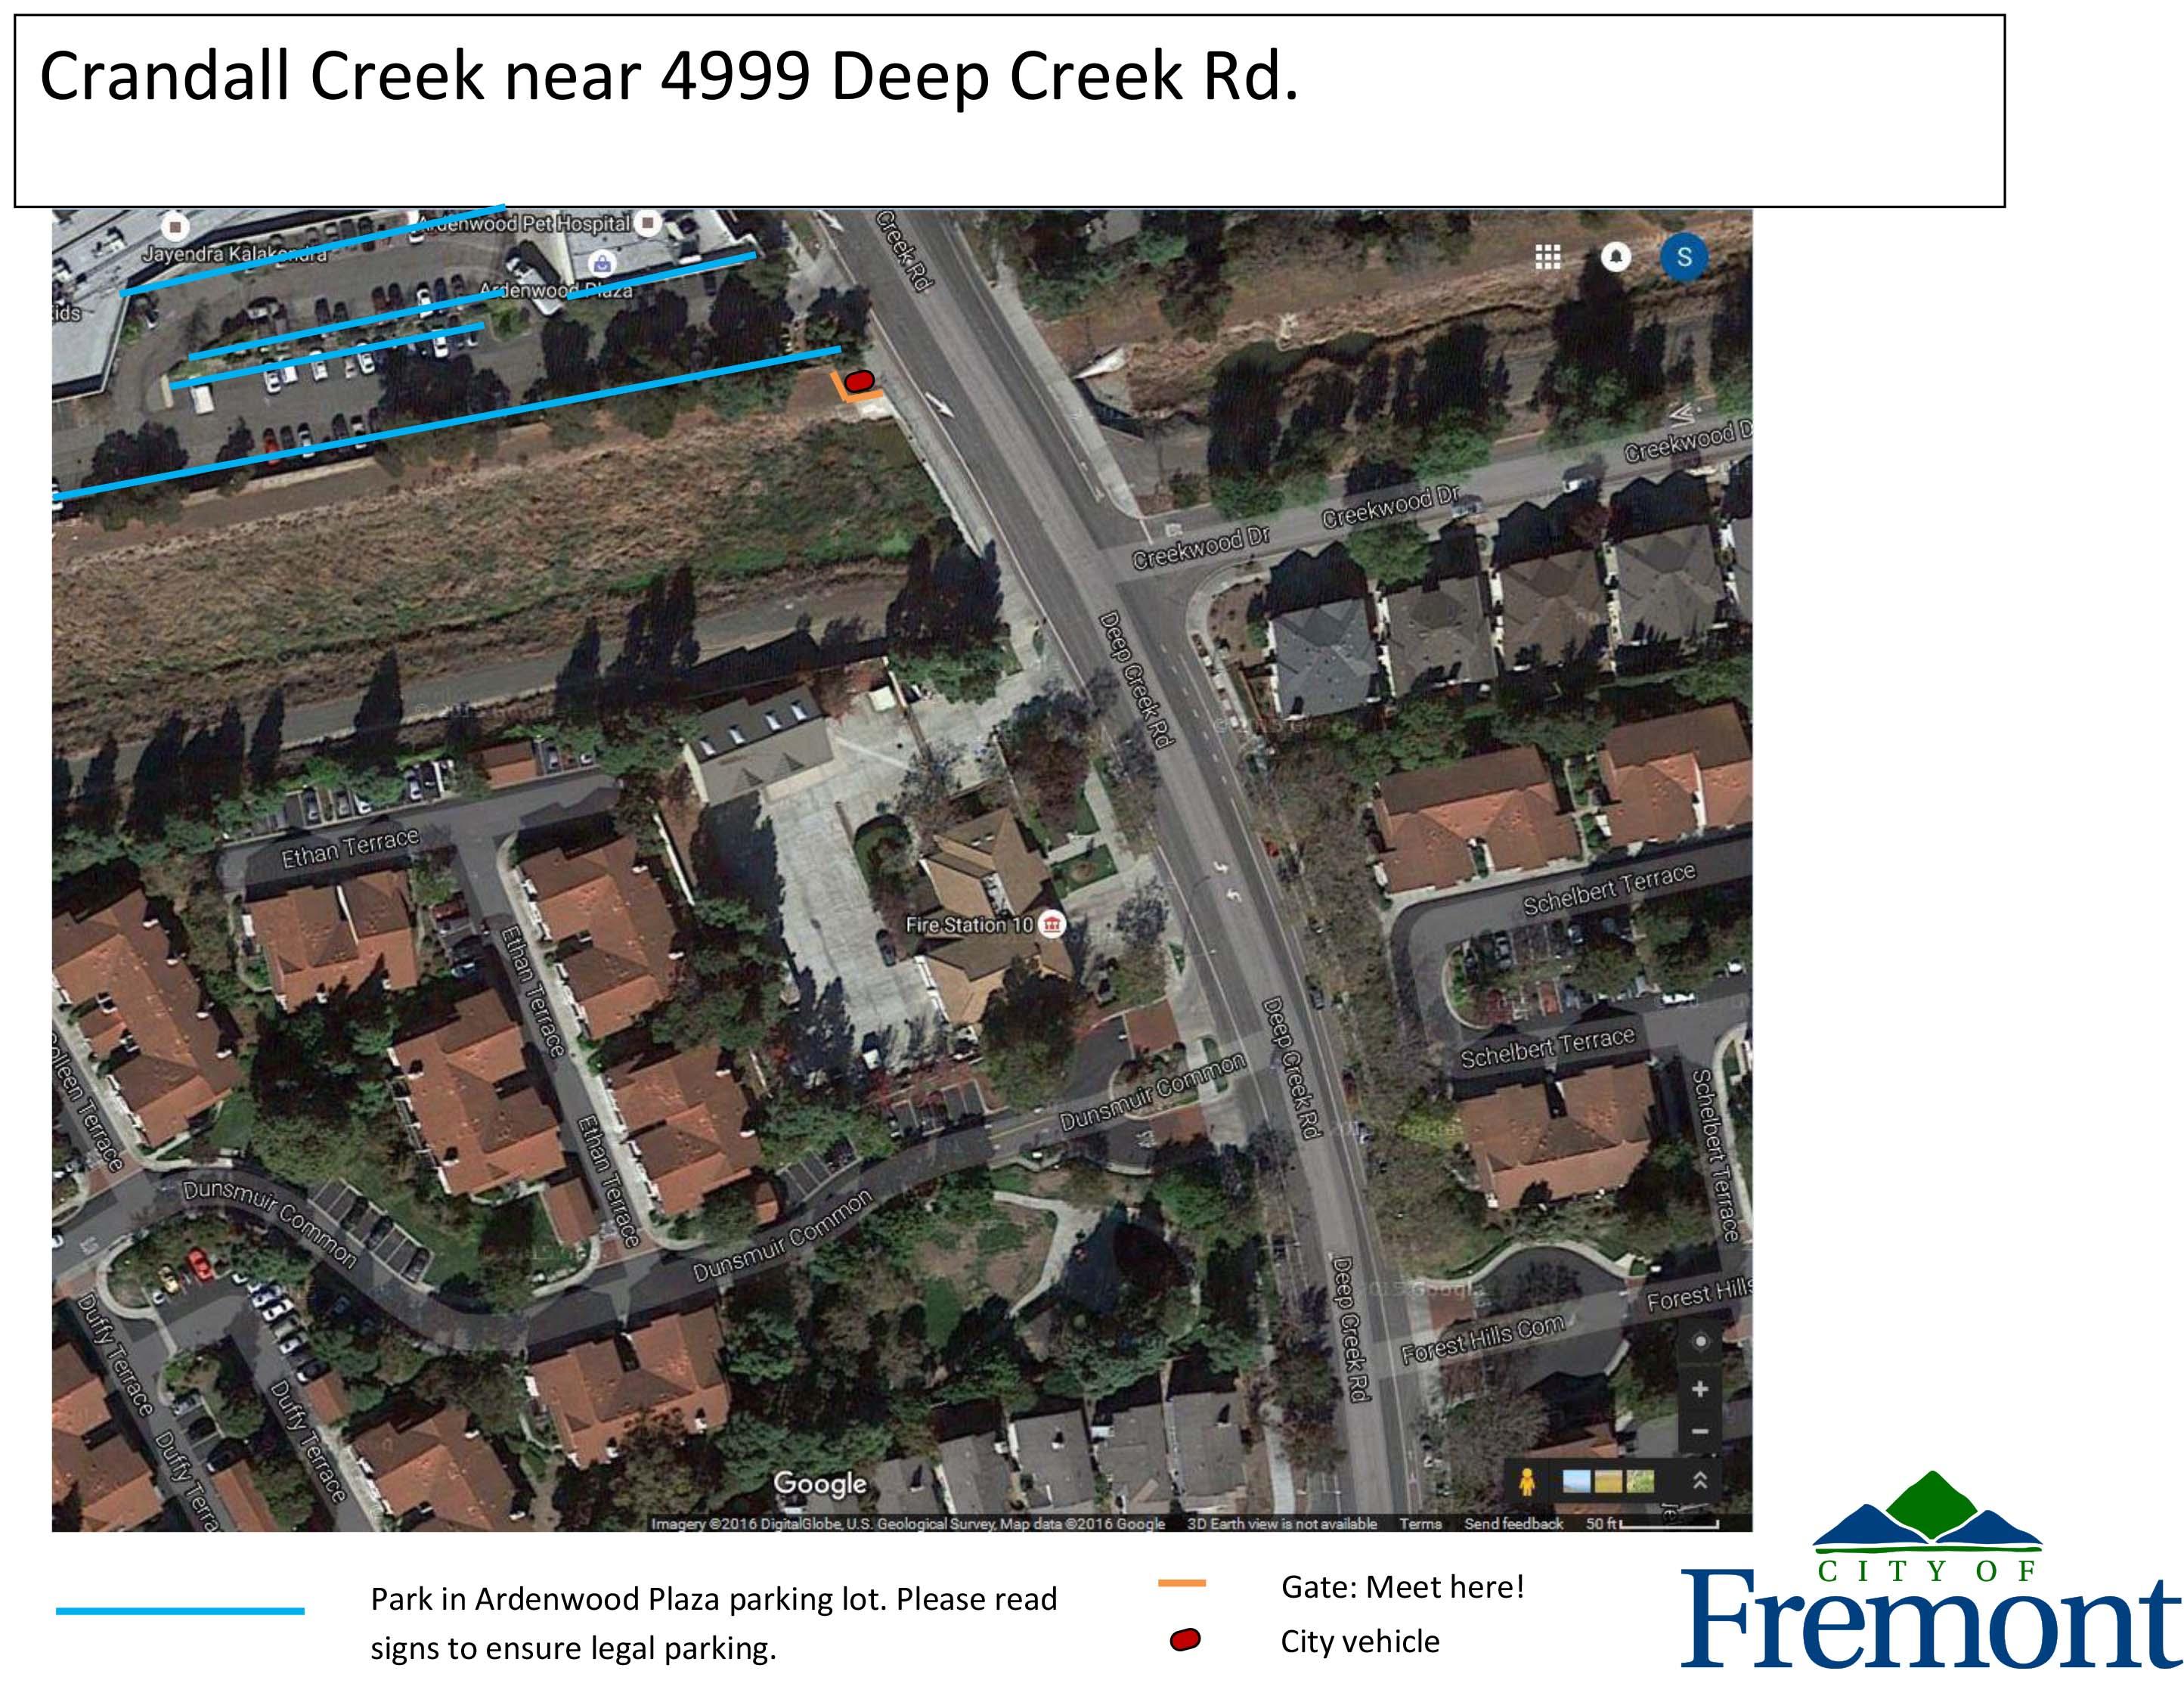 Map of Crandall Creek Hot Spot location, near 5001 Deep Creek Rd.